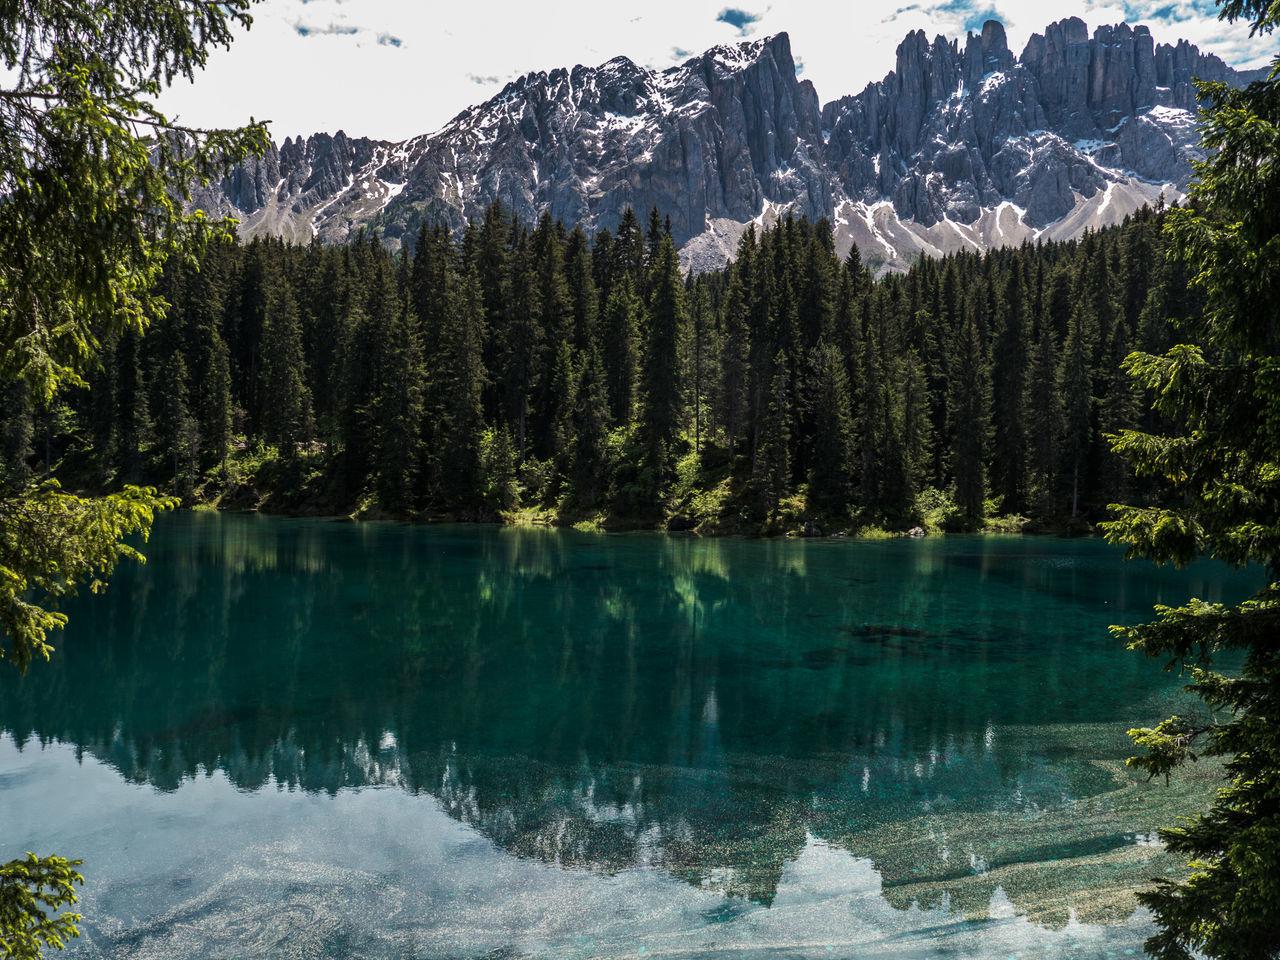 Alto Adige Beauty In Nature Lago Di Carezza Dolomites, Italy Idyllic Karersee Lake Carezza Landscape Majestic Mountain Mountain Range Nature Non Urban Scene Outdoors Reflection Lago Di Carezza Trentino Dolomiti WelschnofenTranquility Travel Destinations Nova LevanteTree